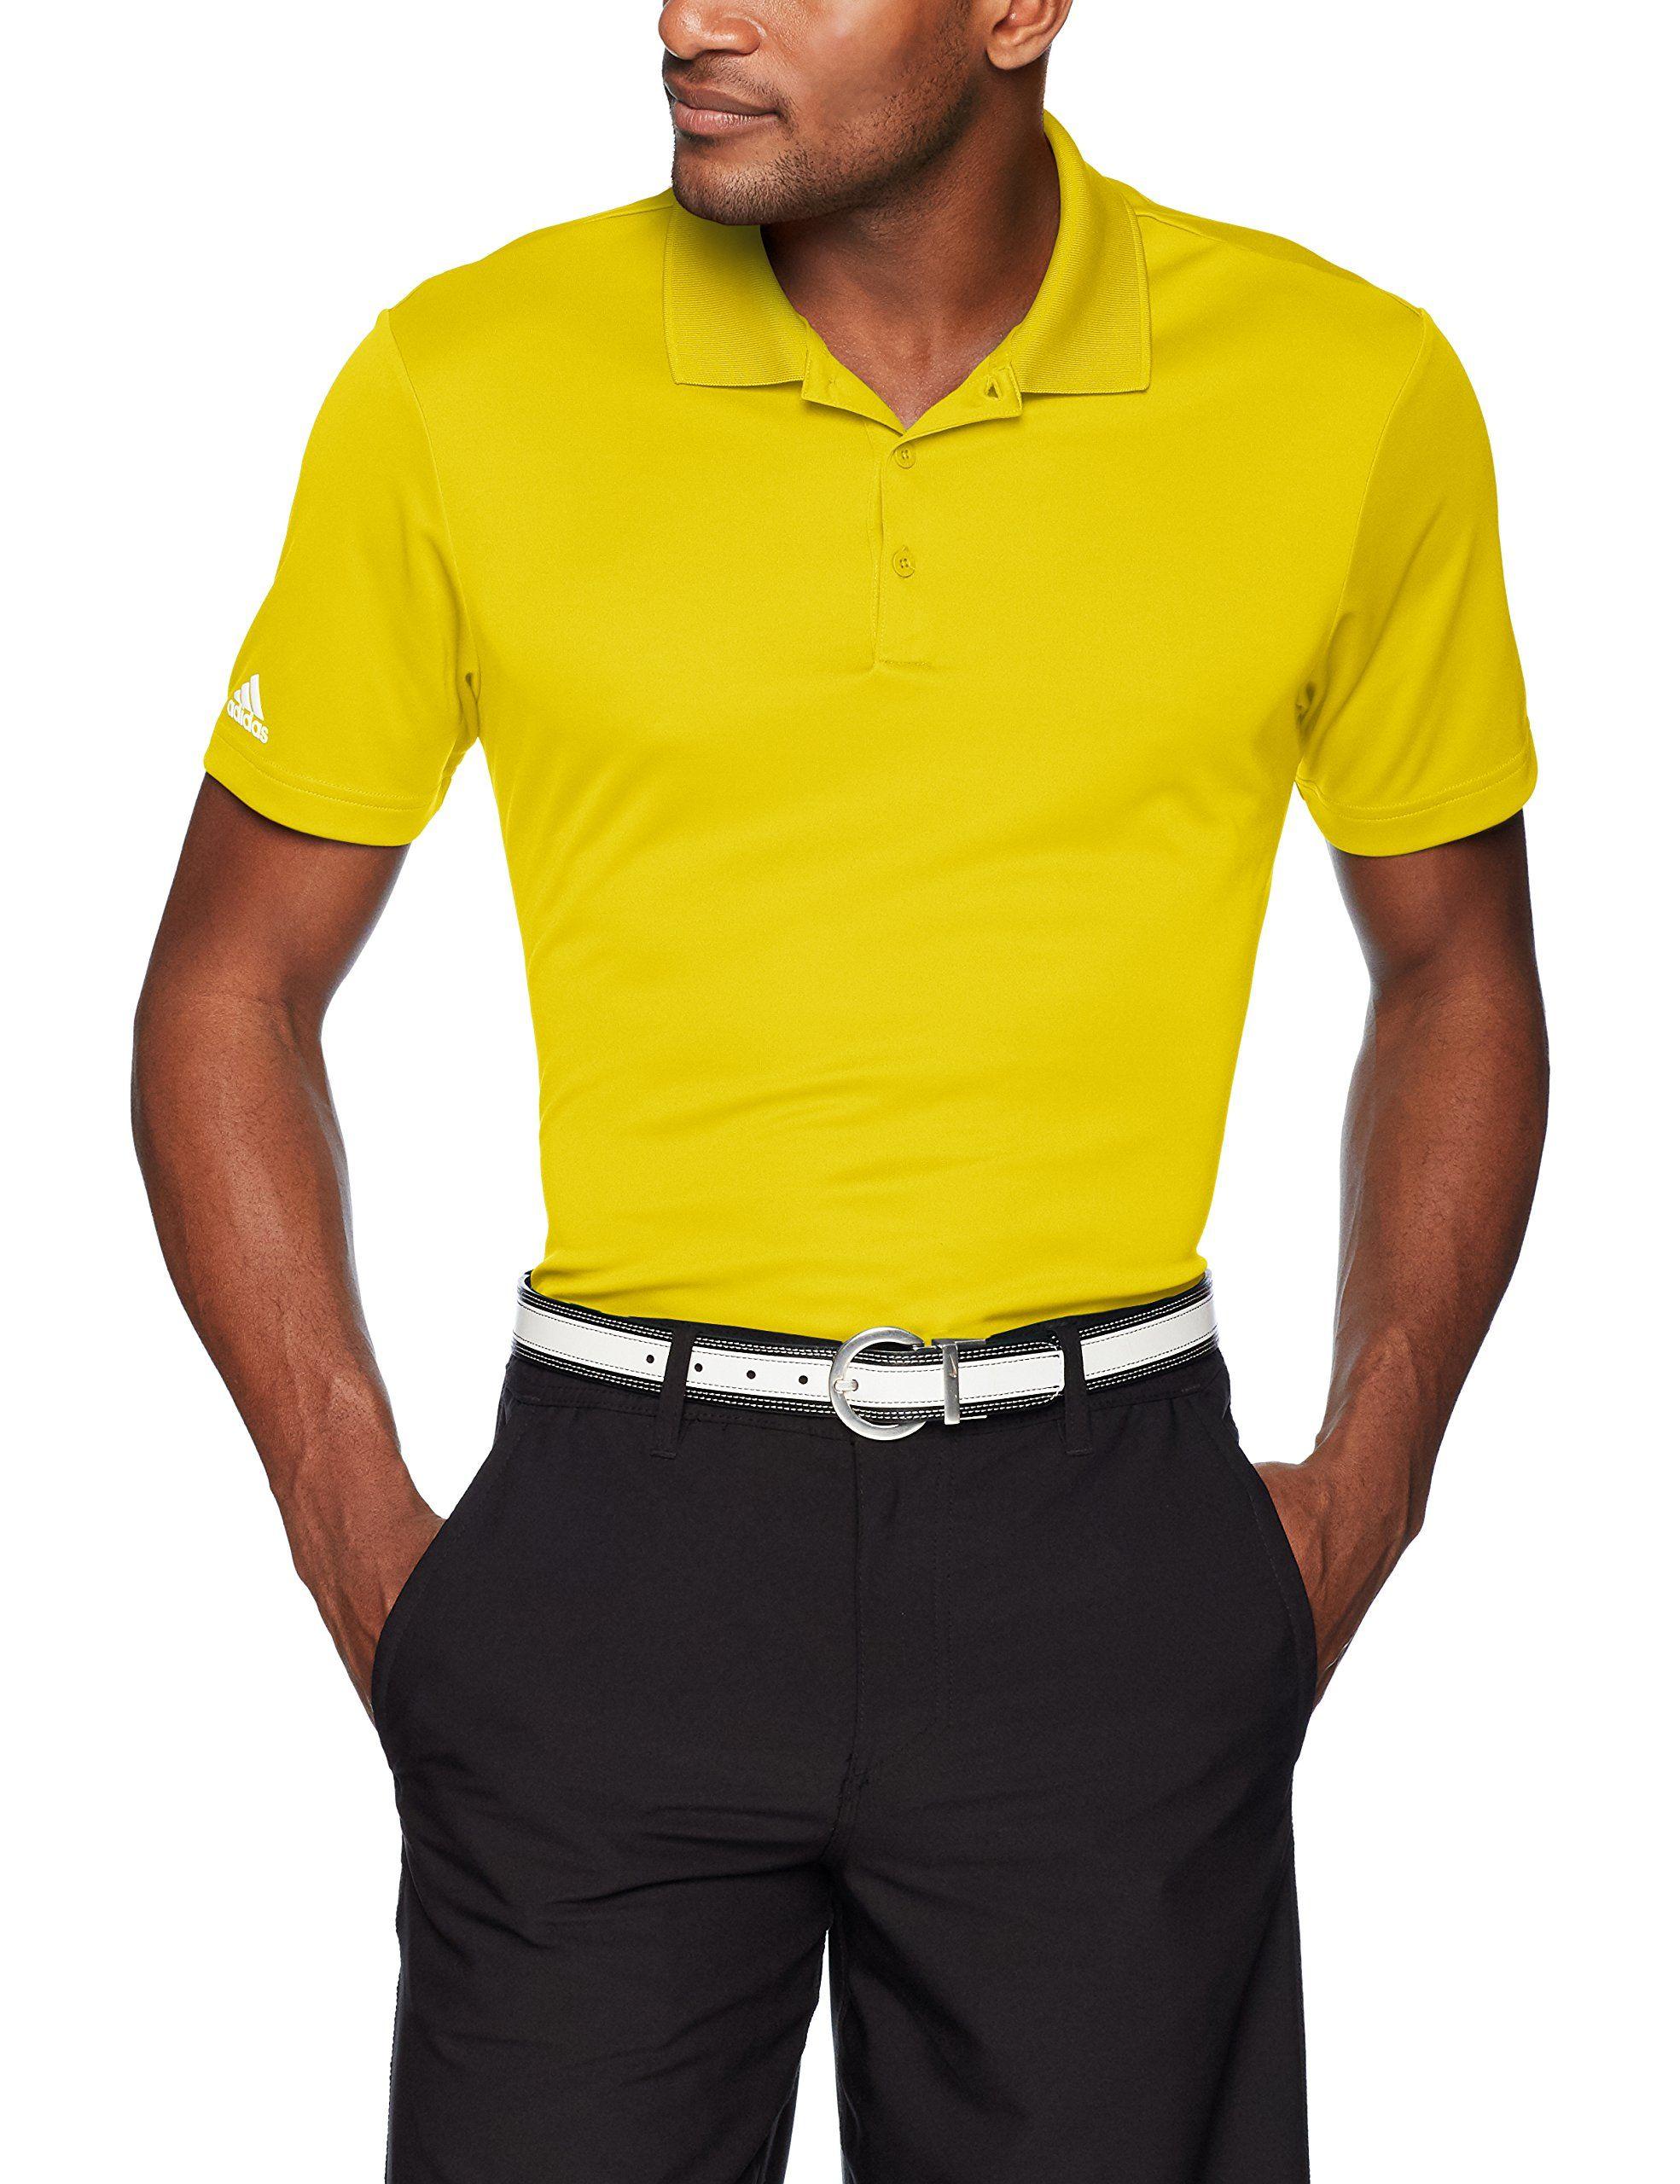 Men Golf Clothing Adidas Golf Performance Polo Bright Yellow Xlarge Mens Shirt Dress Mens Shirts Adidas Men